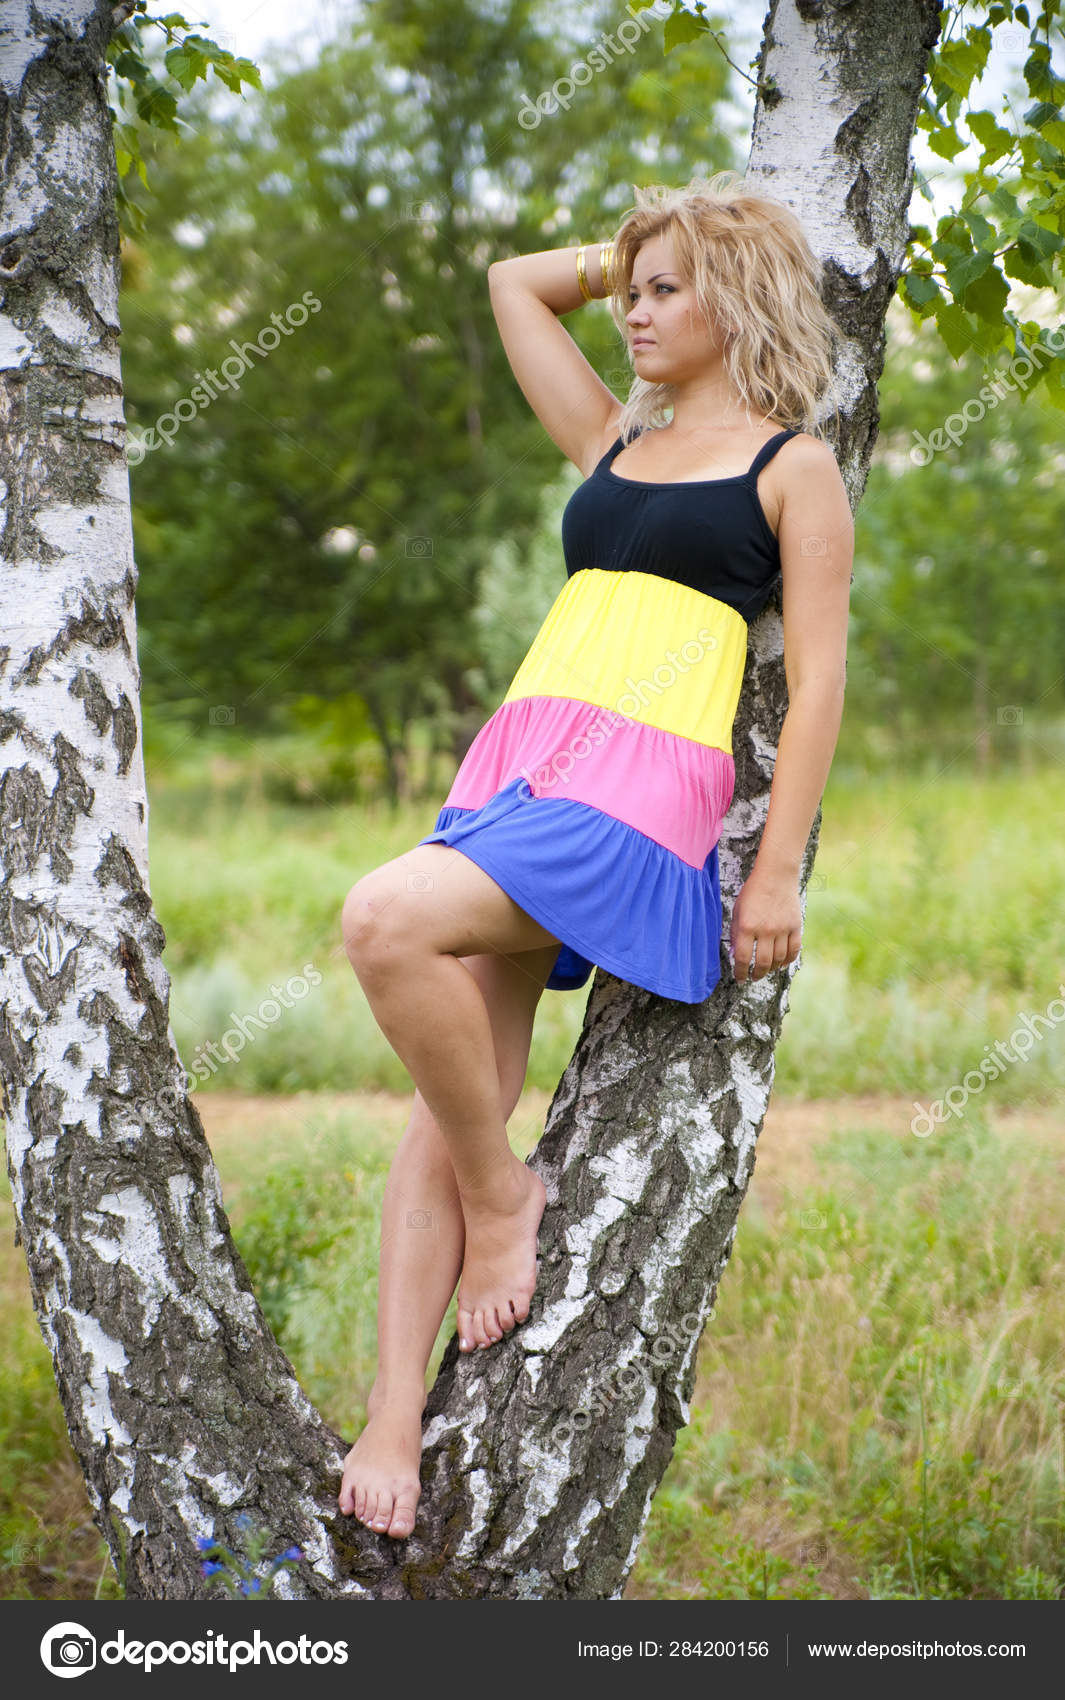 https://st4.depositphotos.com/26568676/28420/i/1600/depositphotos_284200156-stock-photo-beautiful-girl-summer-forest-nature.jpg